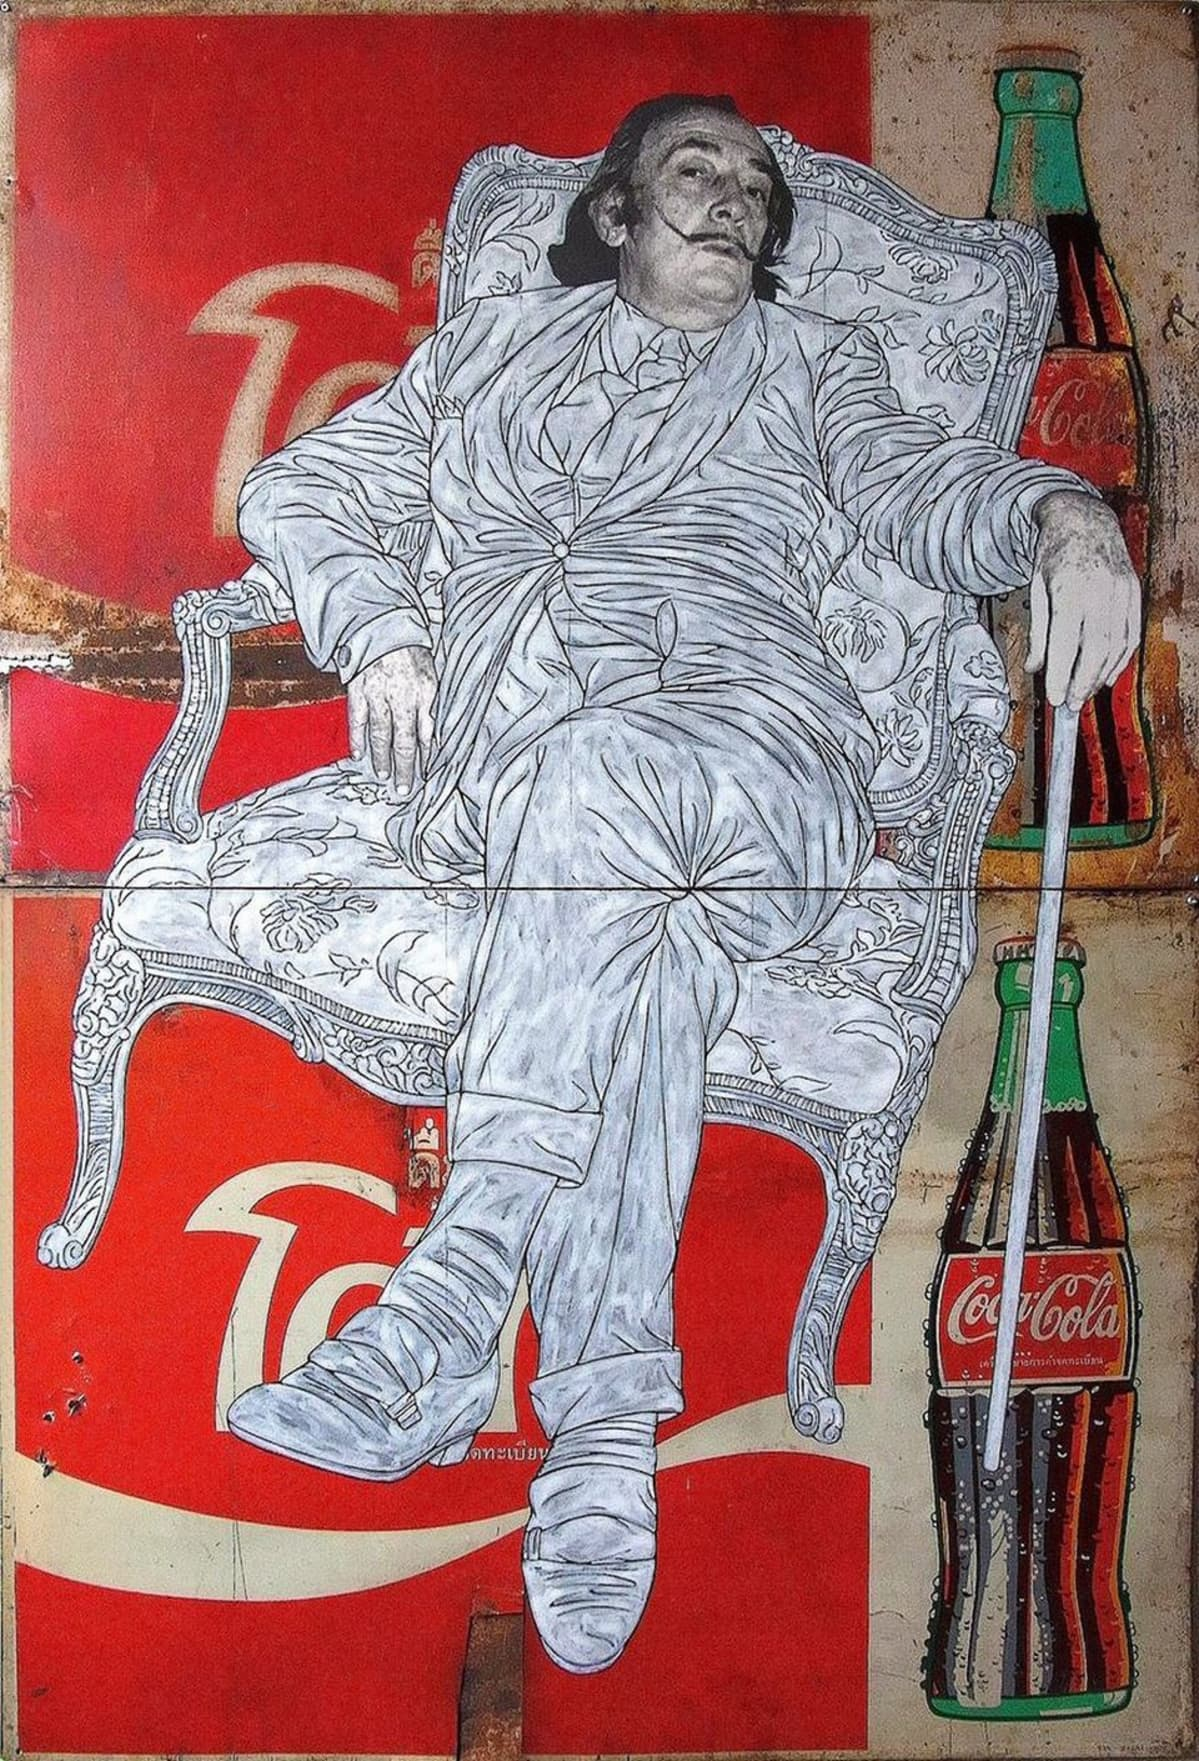 Pakpoom Silaphan: Dali Sits on Coke, 2014